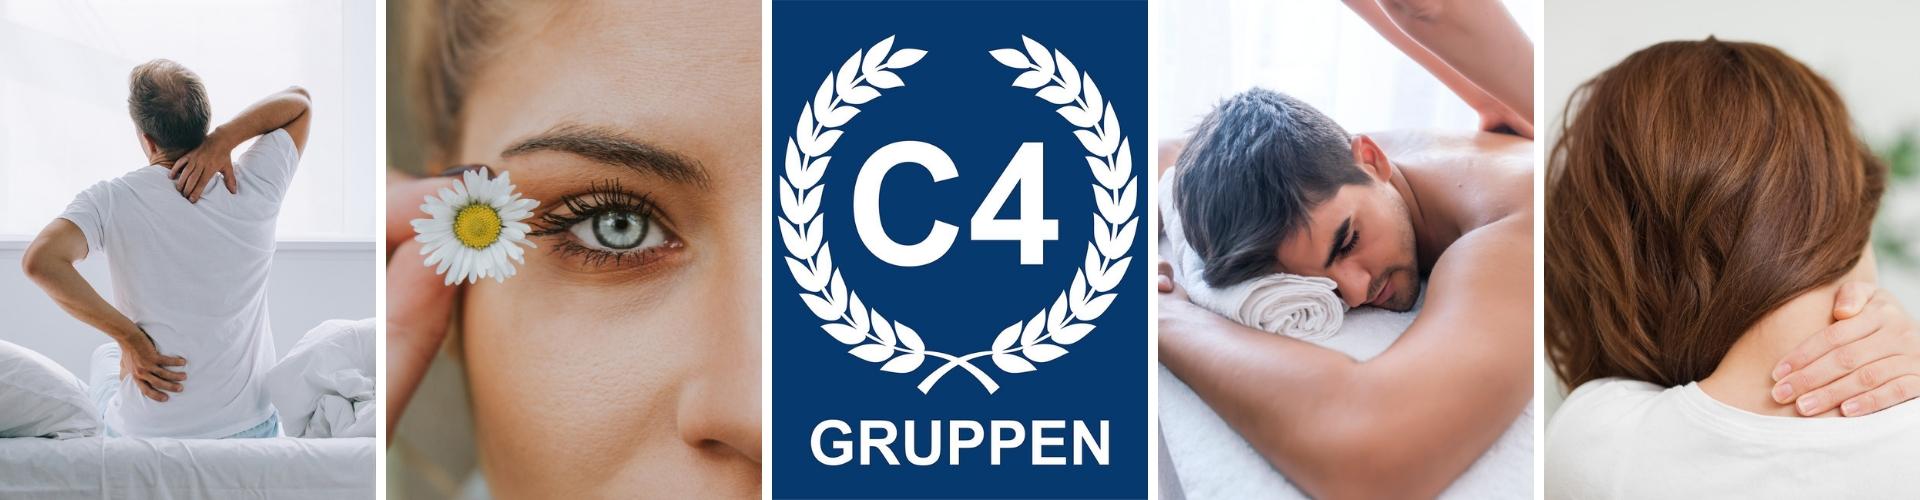 C4 Gruppen